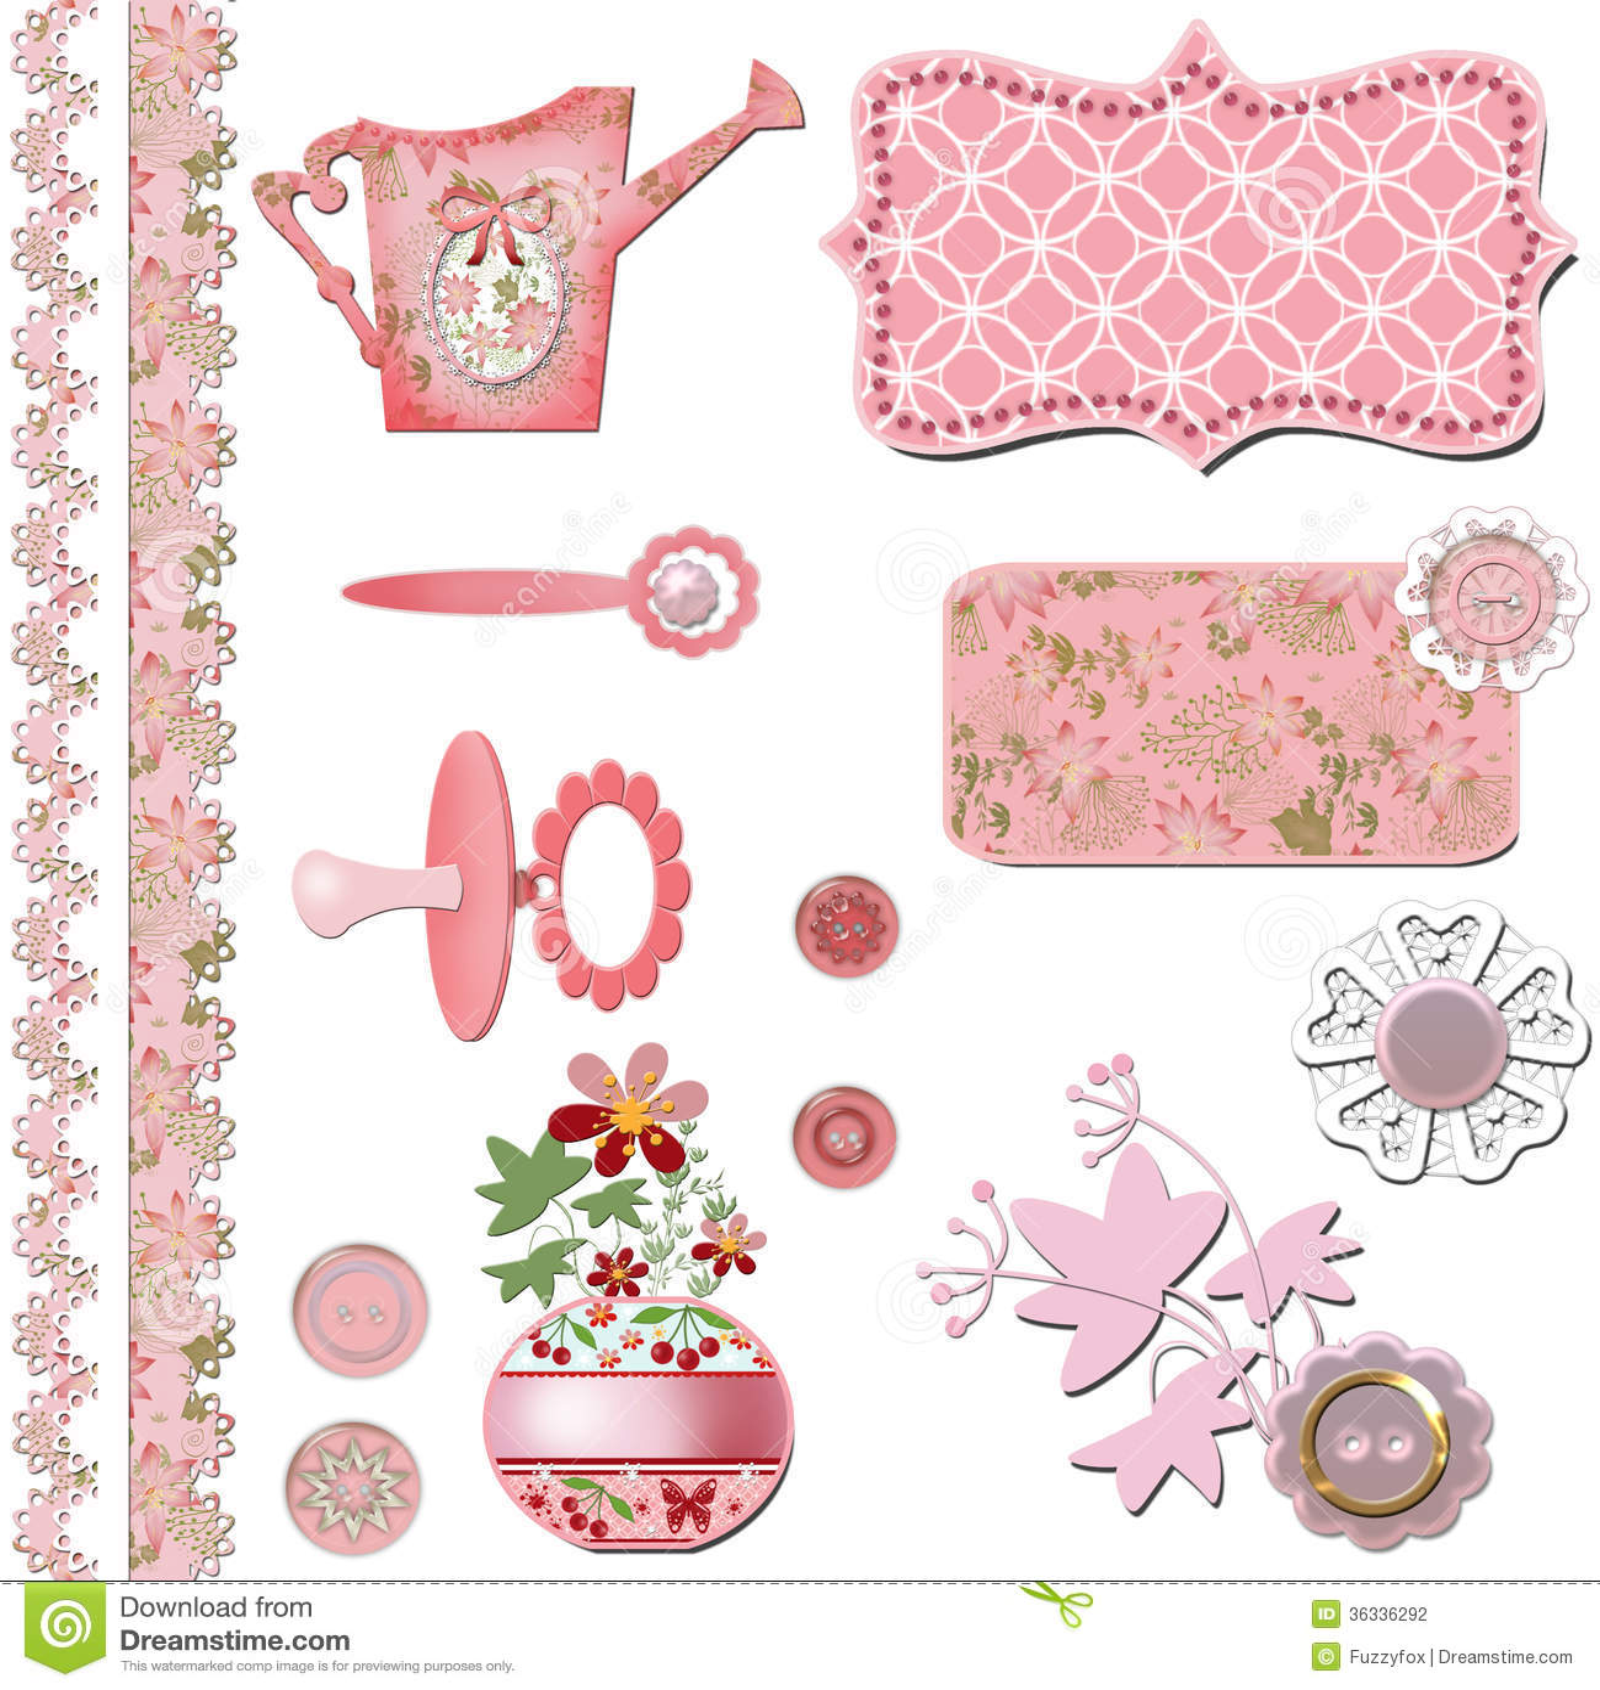 How to scrapbook for baby girl - Scrapbook Baby Shower Girl Set Design Stock Photography